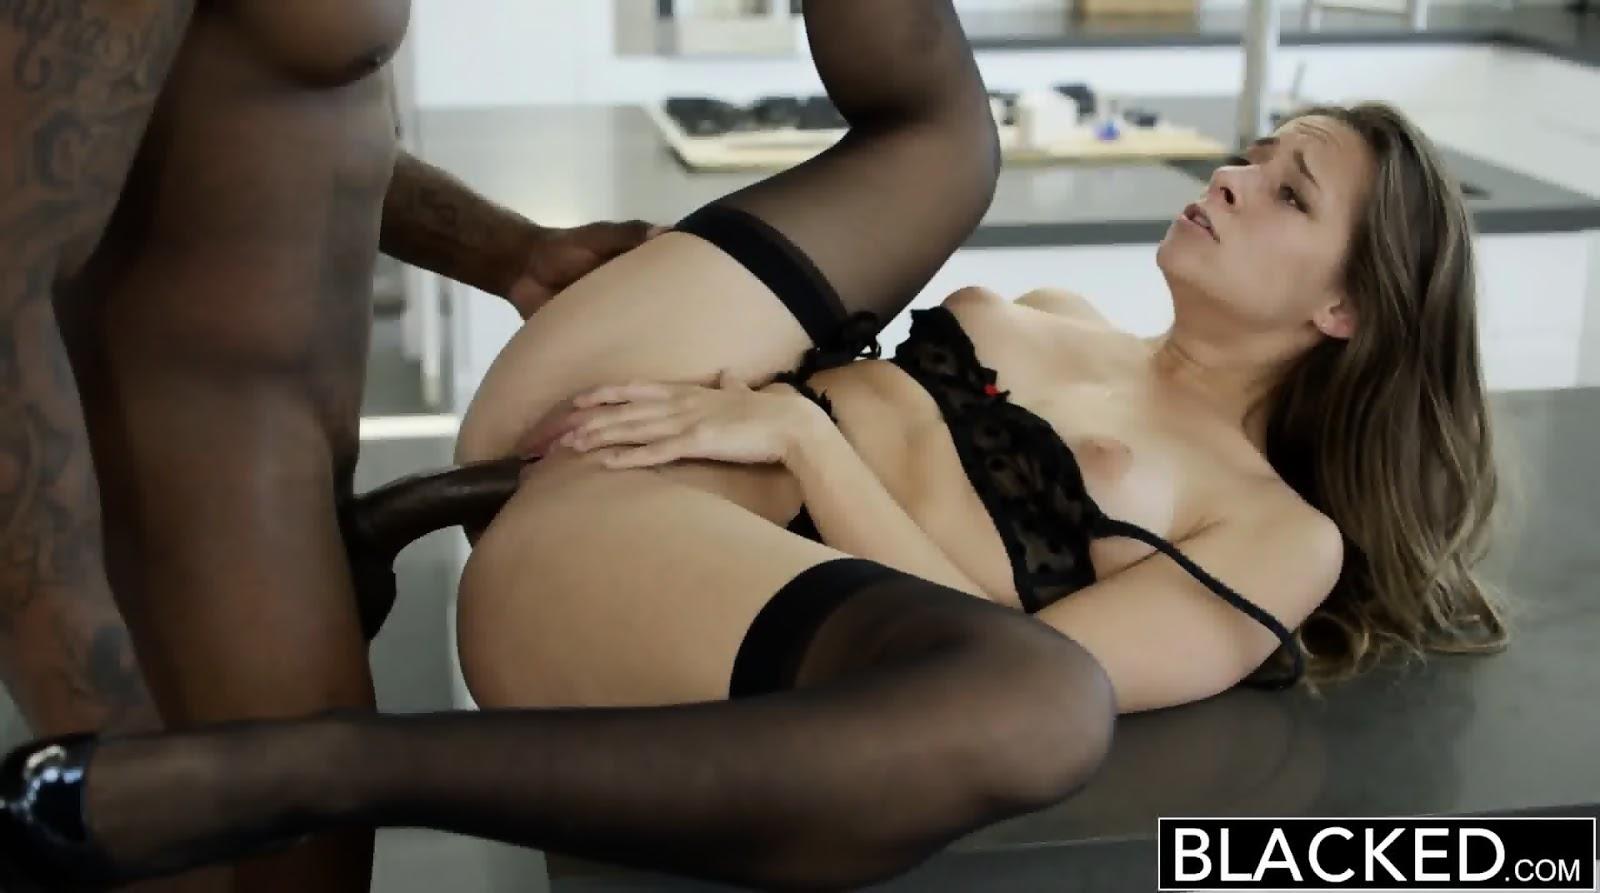 Blacked - My Girlfriends Hot Sister Loves BBC!